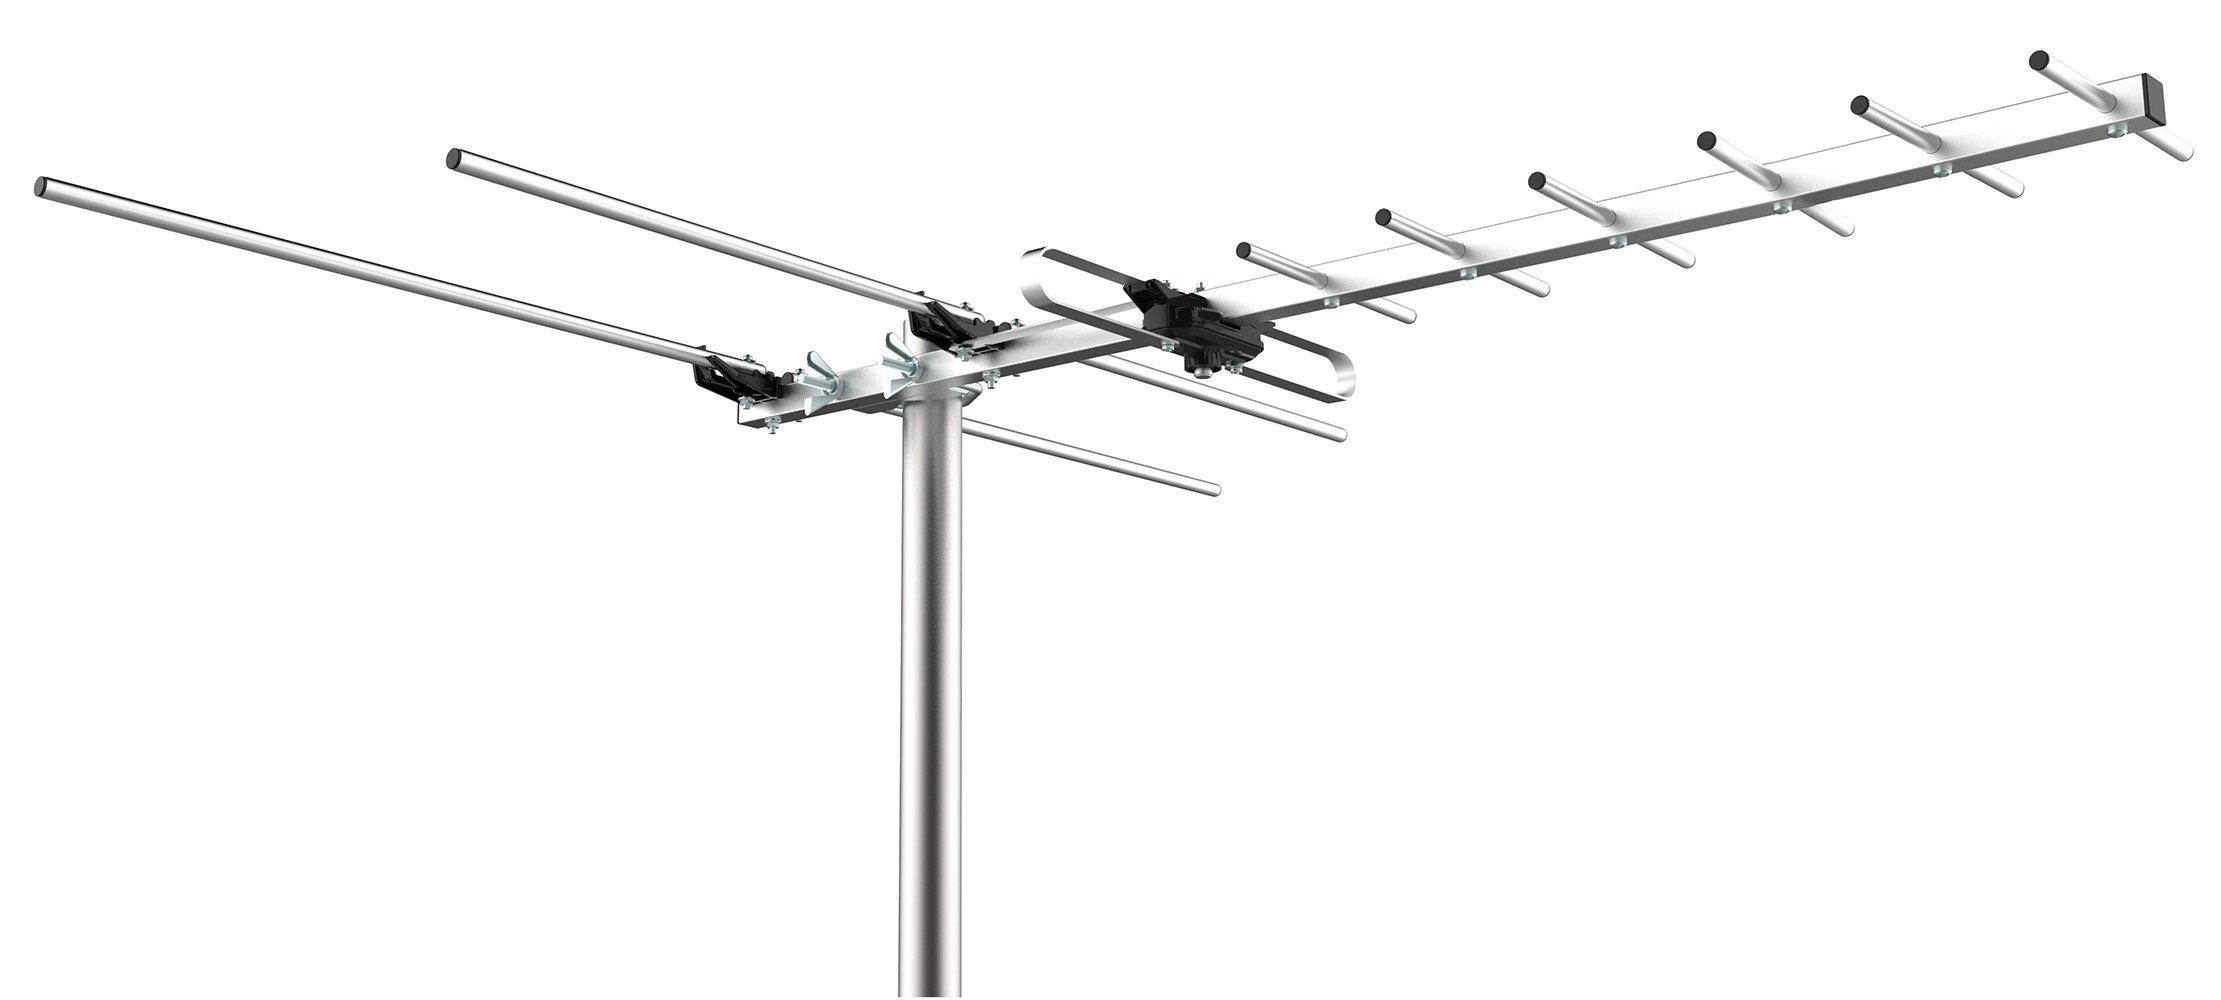 Mediasonic HOMEWORX HDTV Outdoor Antenna - 80 Miles Range Support UHF/VHF (HW-27UV)